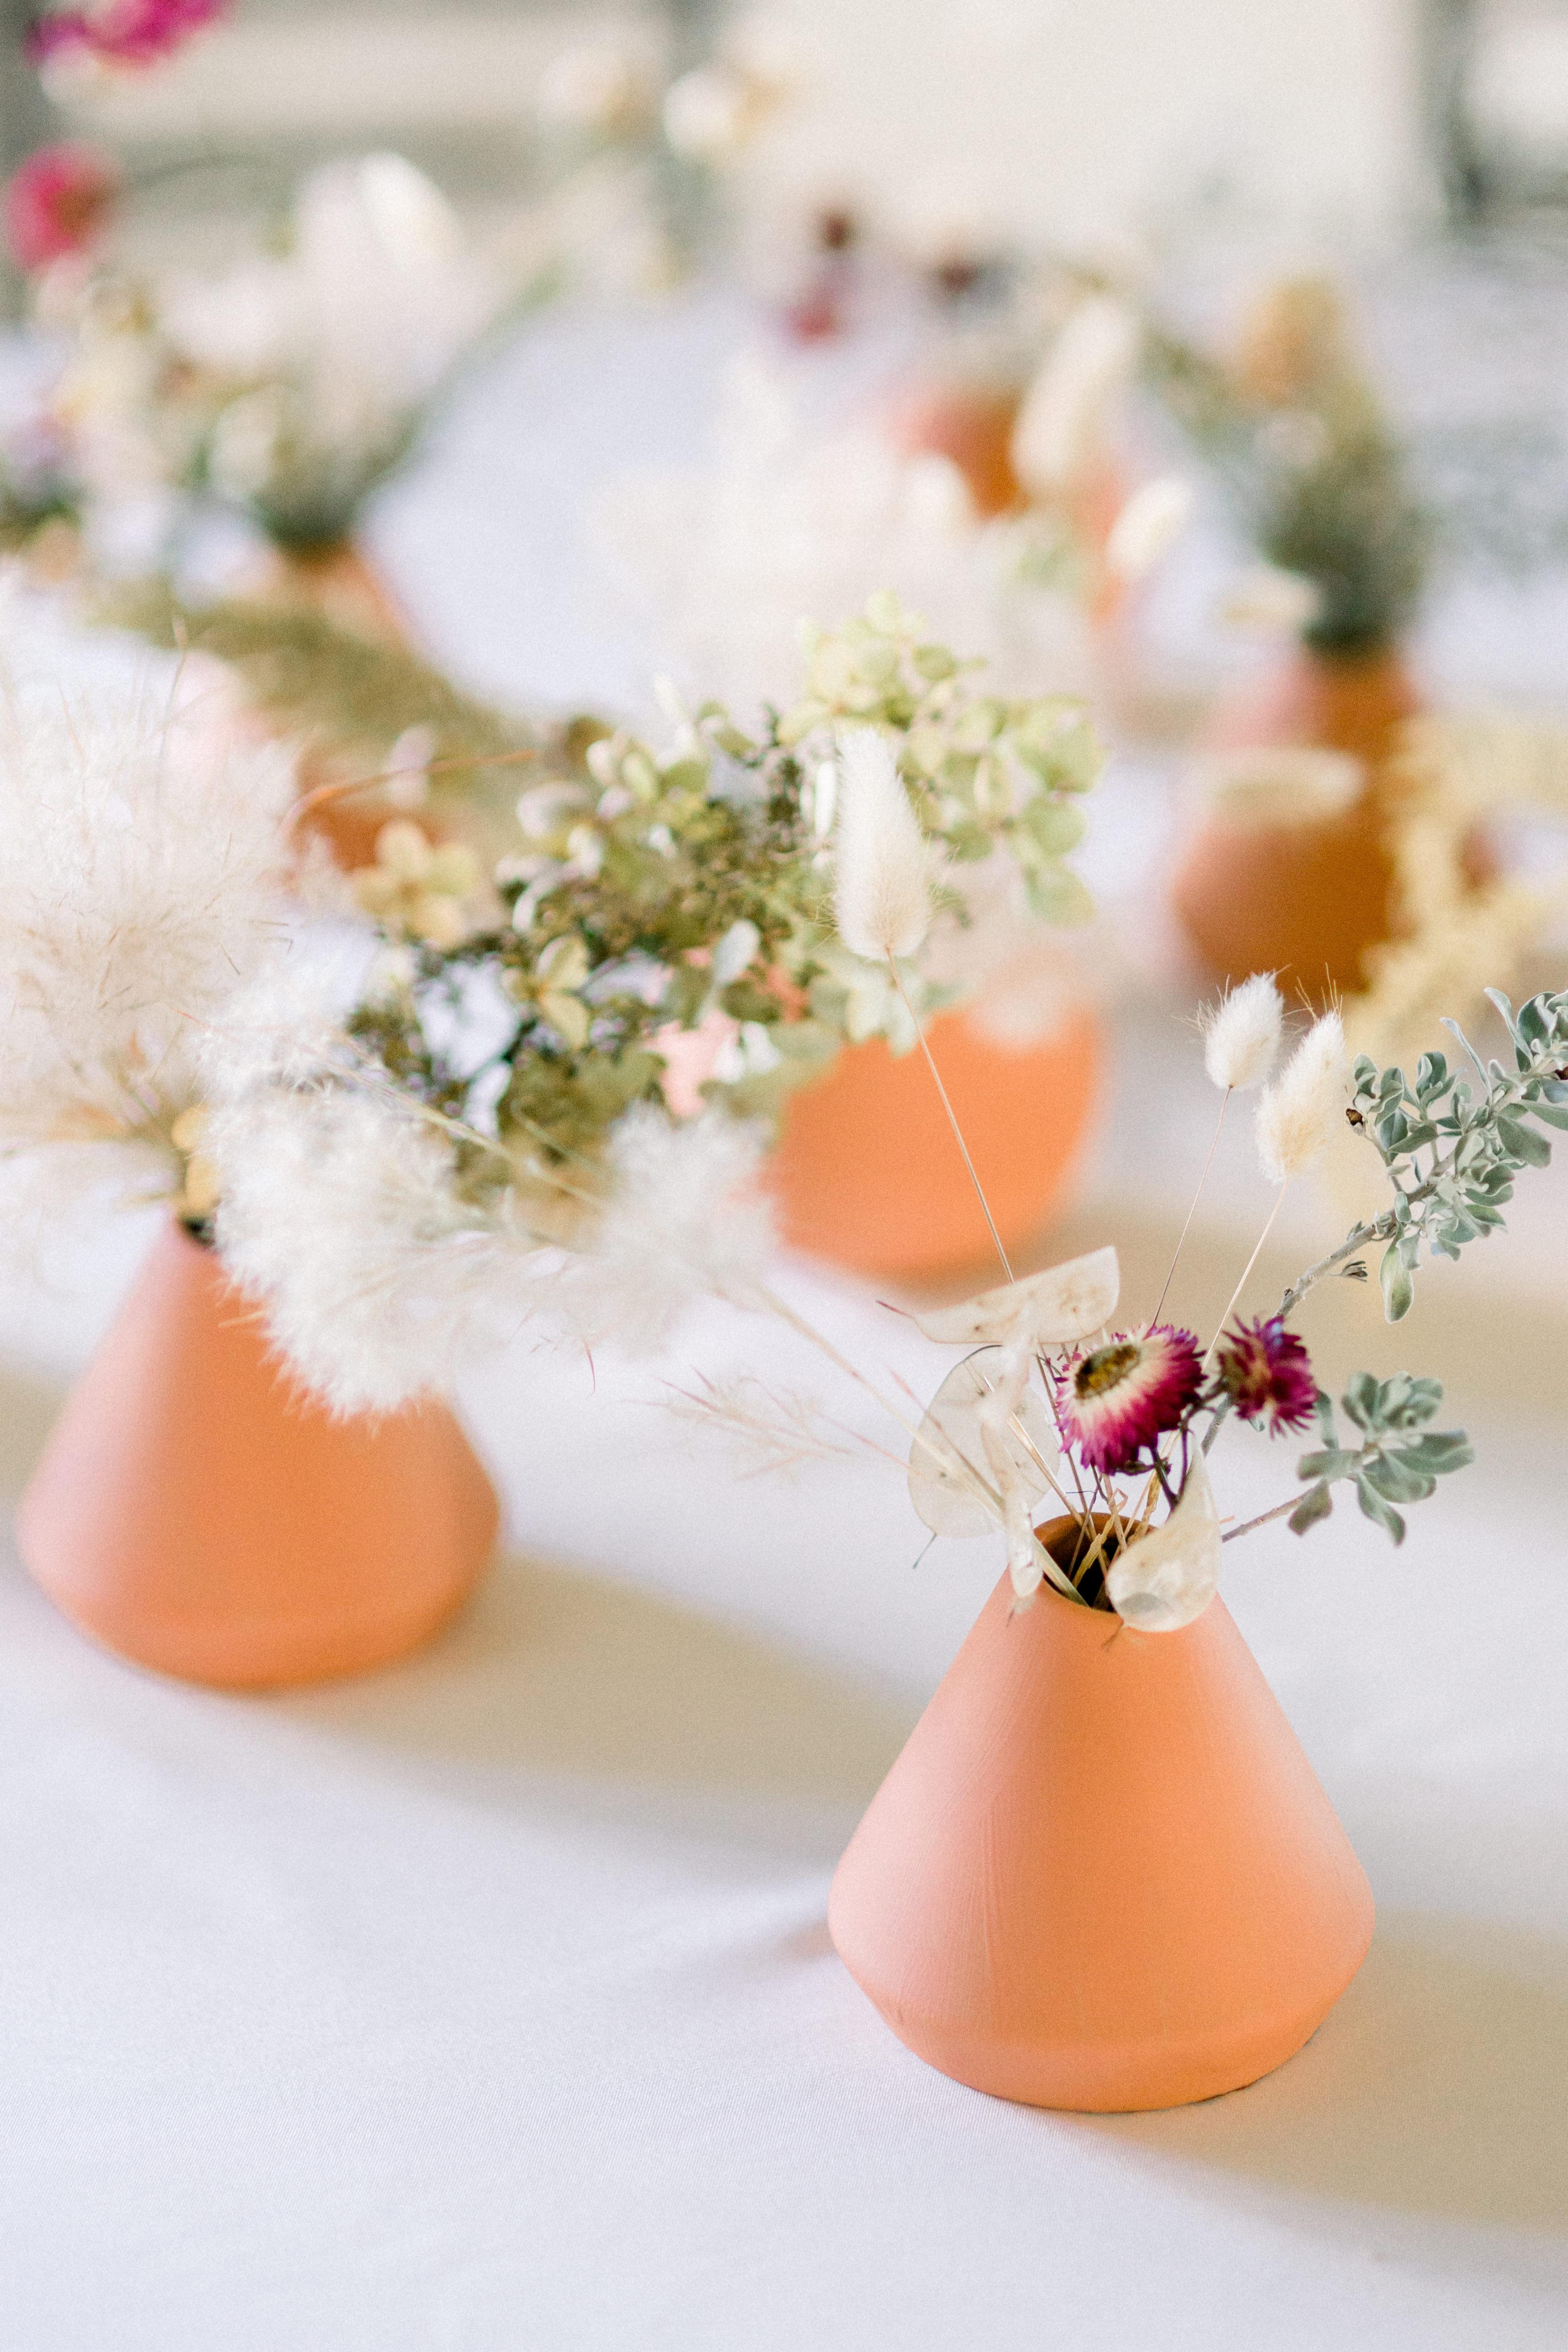 Cone Shaped Modern Wedding Centerpiece